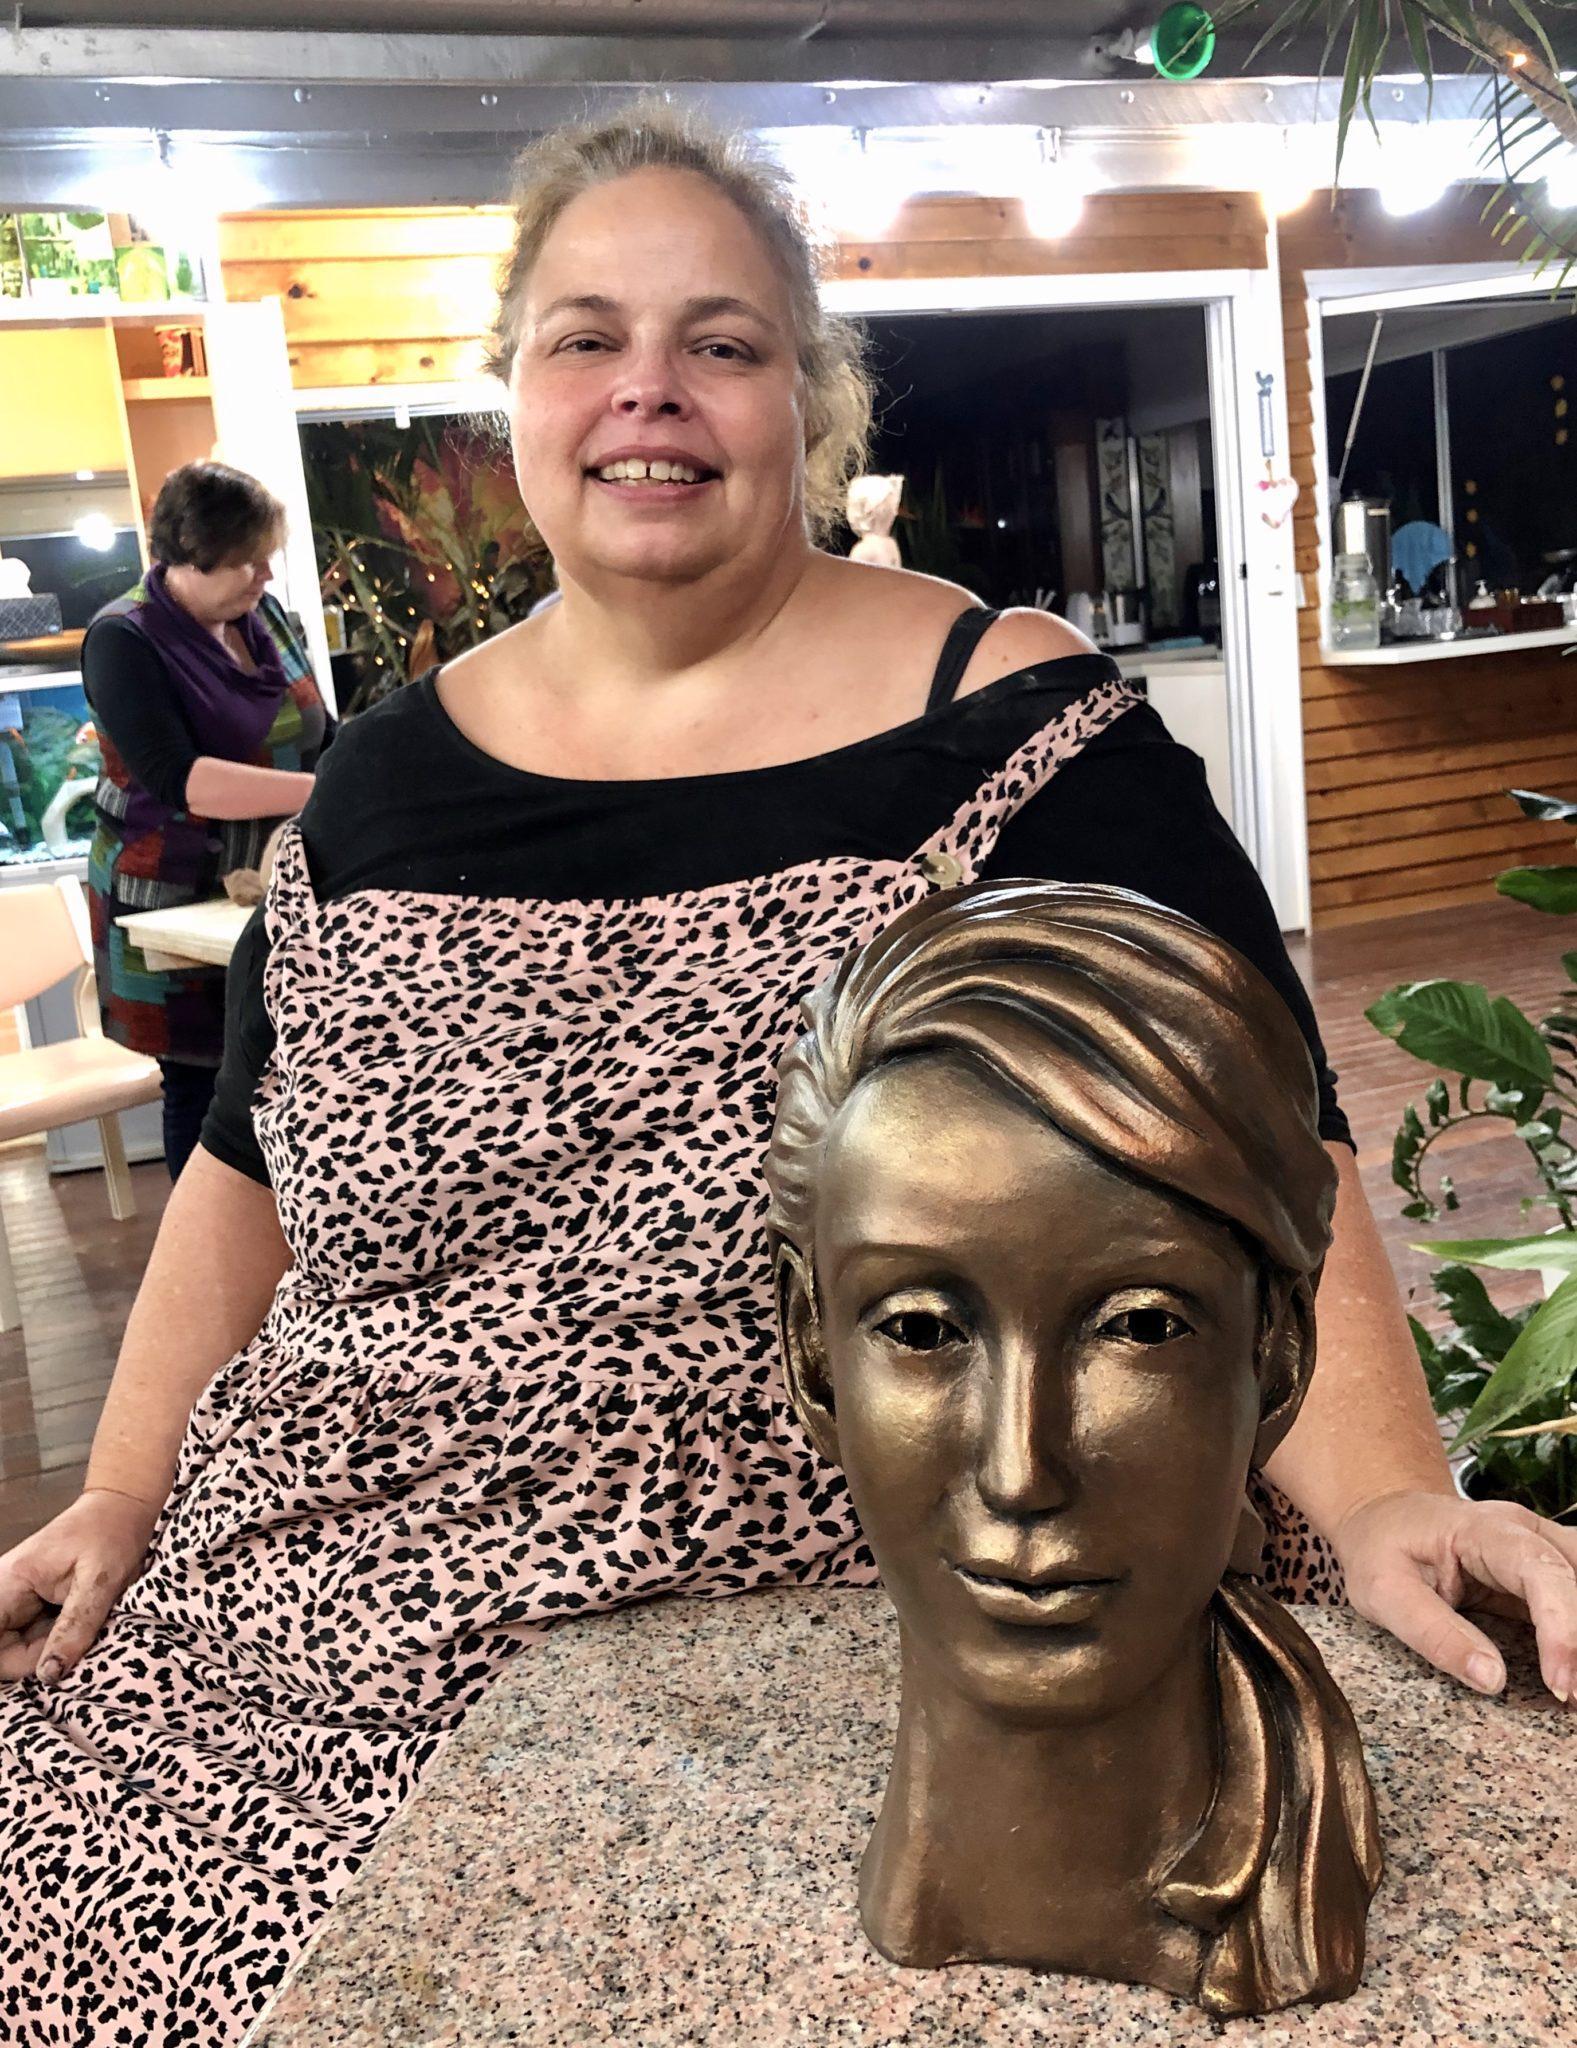 Bronzed her first beginners clay head sculpture at the art class